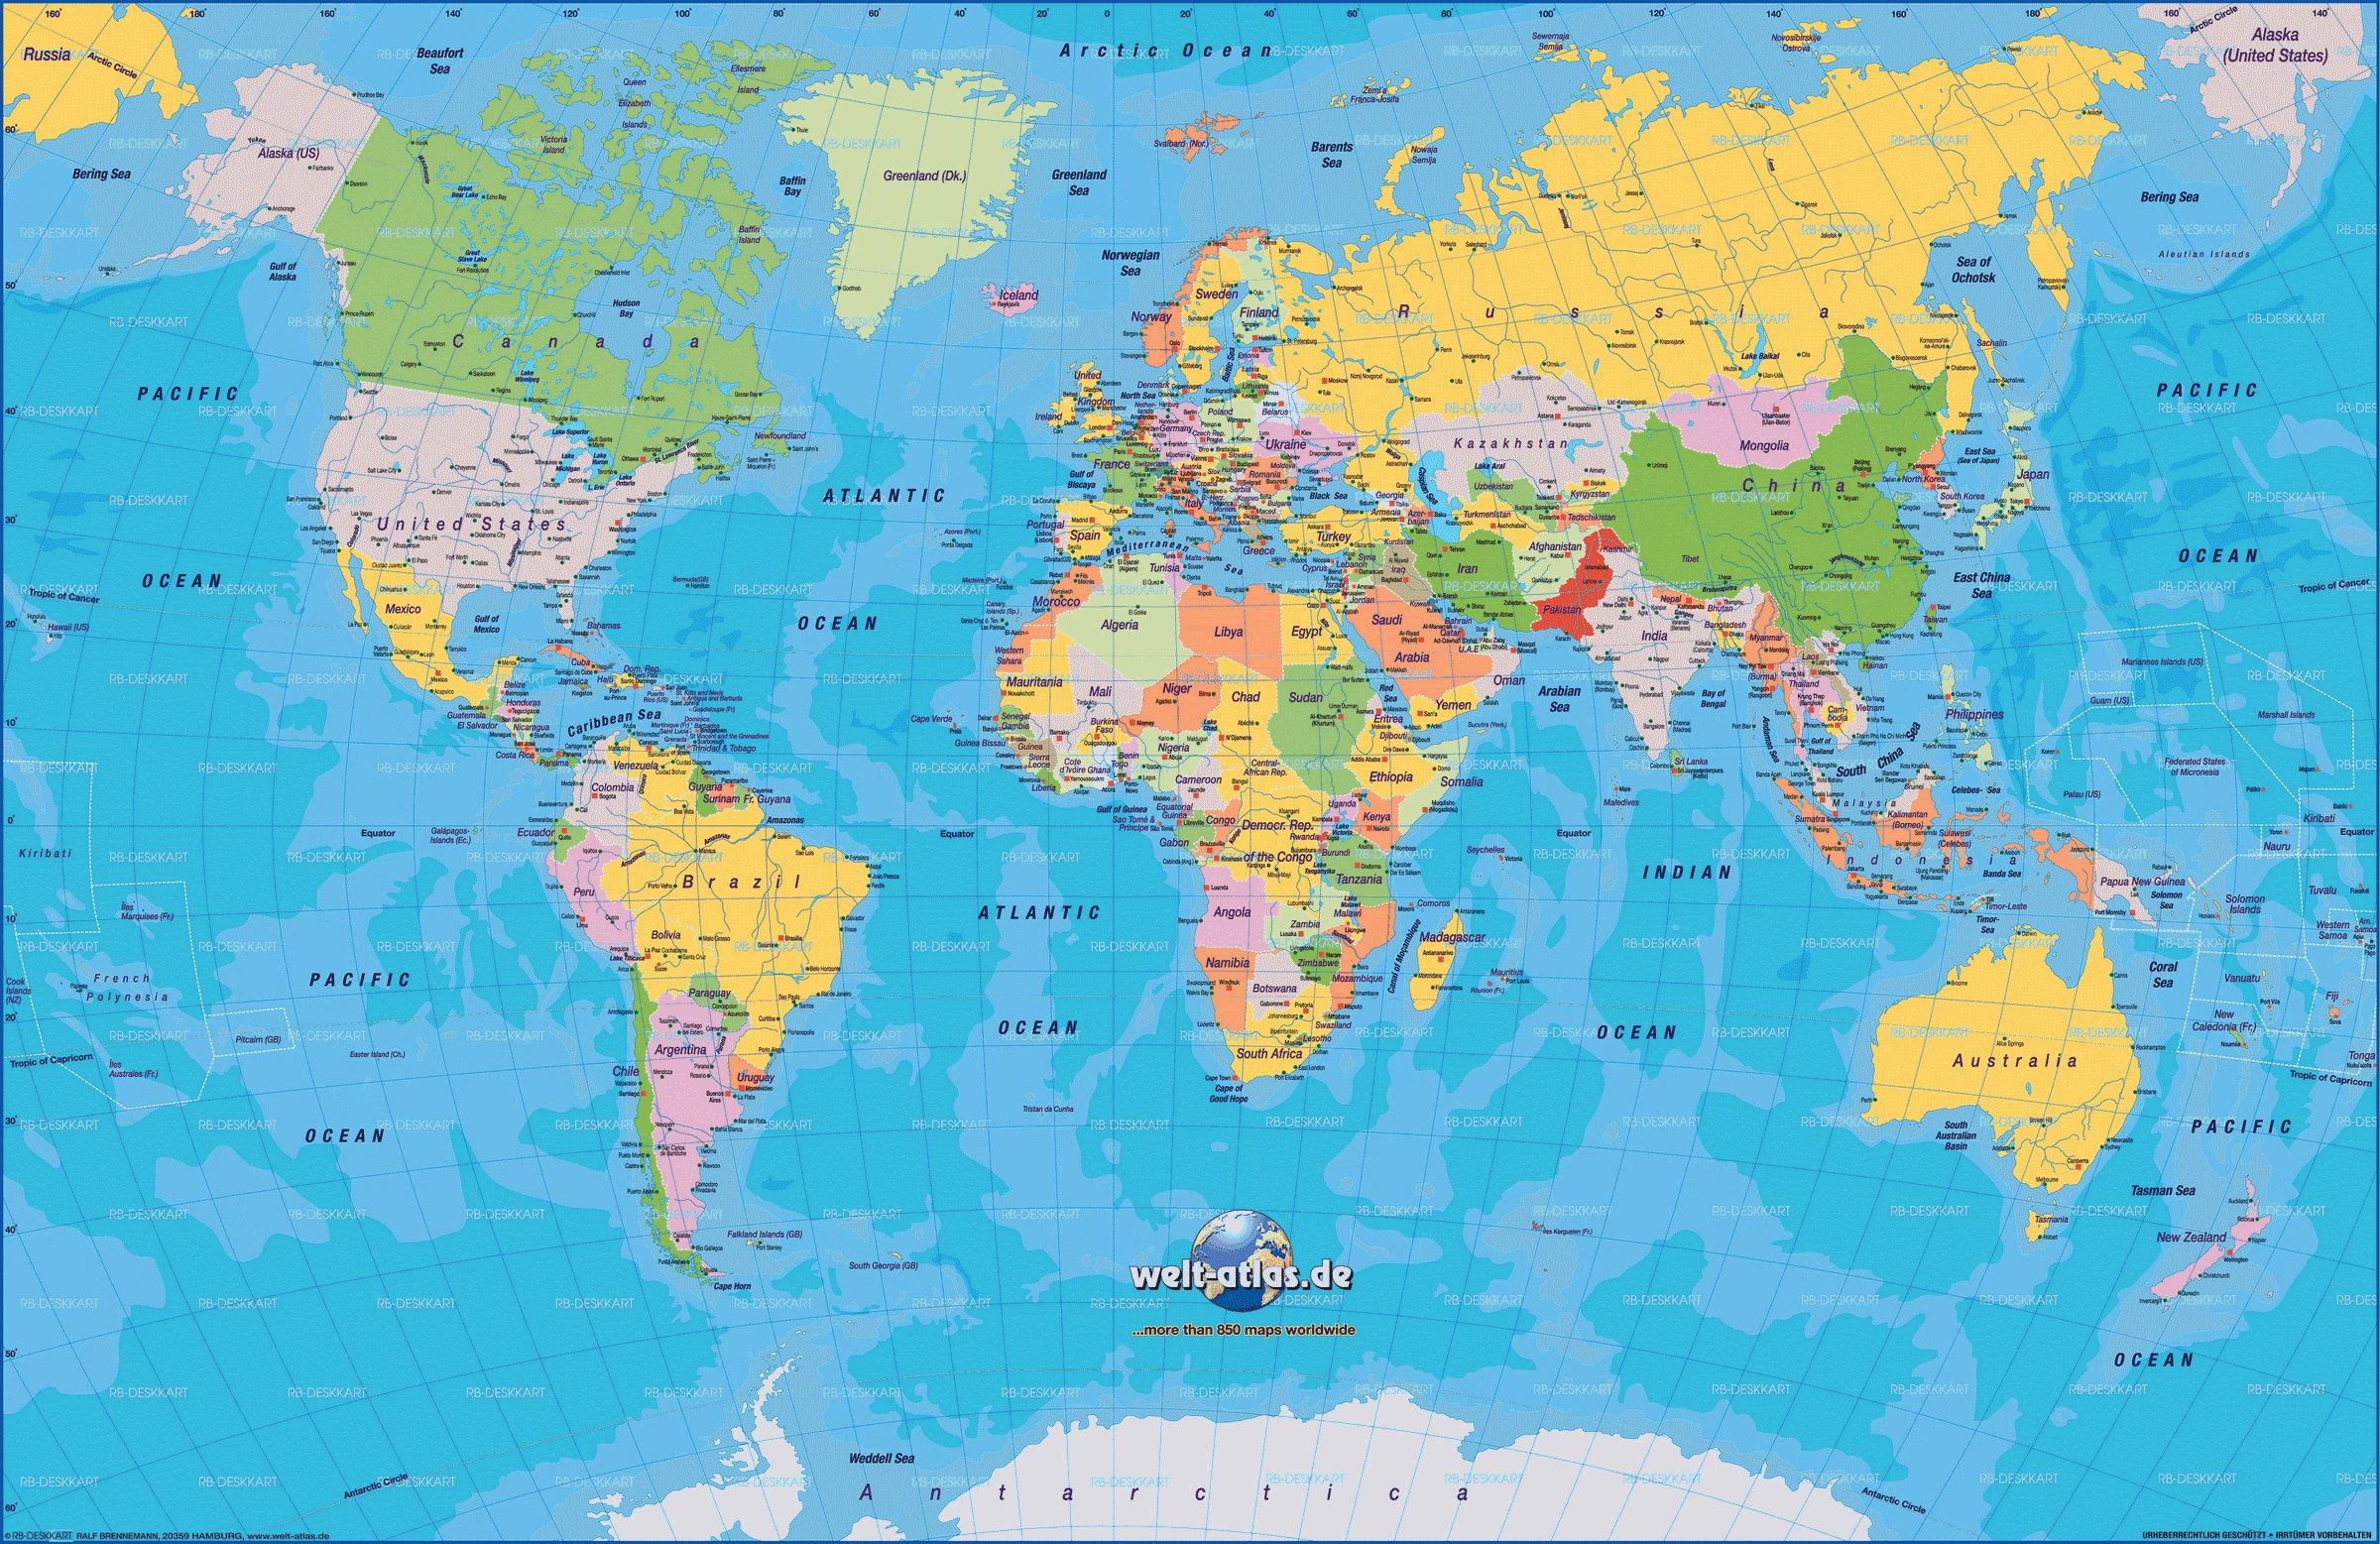 australie carte monde